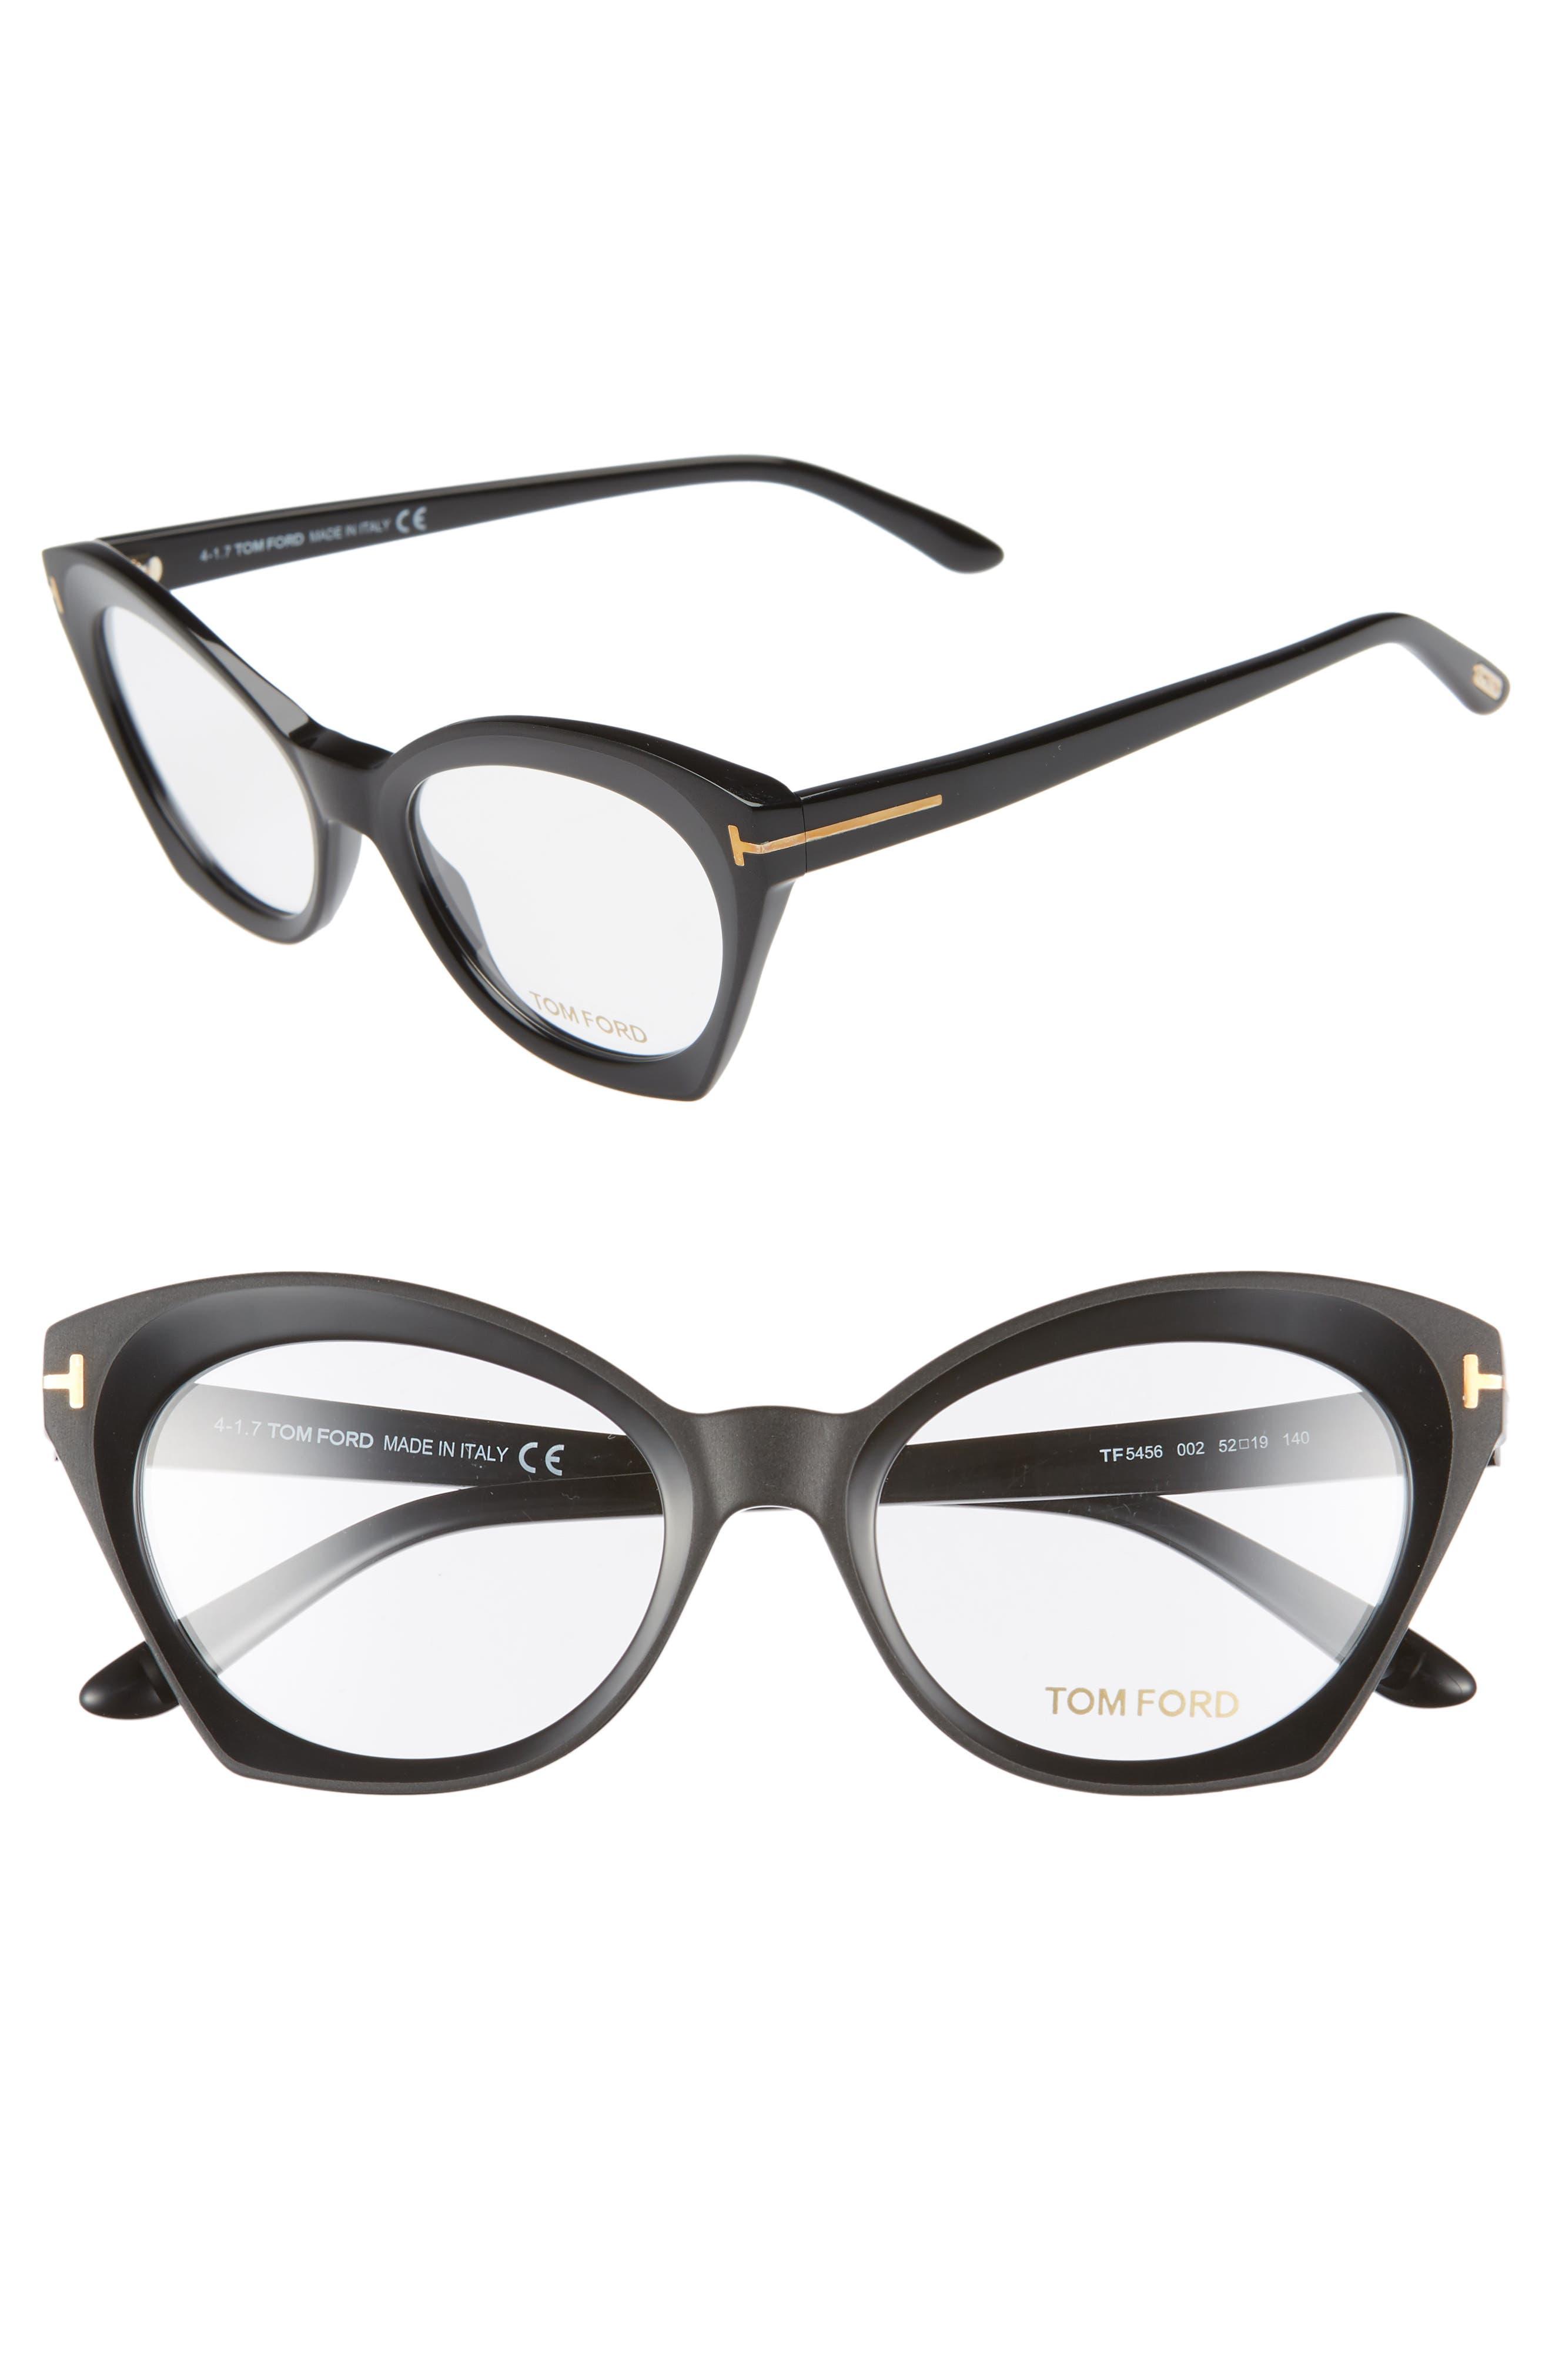 ff4b2403cf6a Tom Ford Optical Frames   Reading Glasses